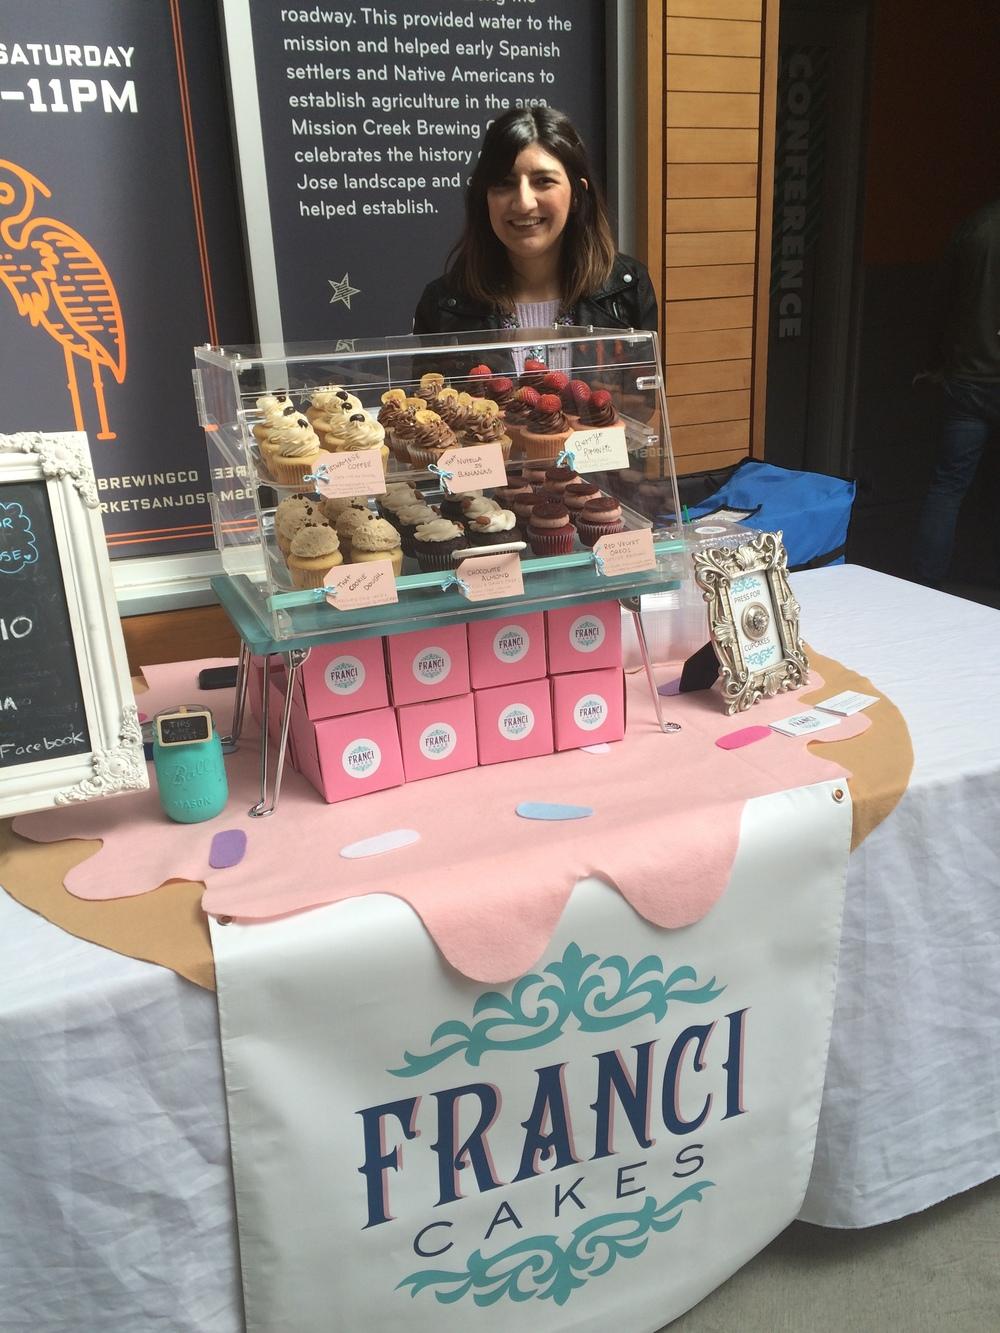 franci cakes, cupcakes, cupcakes stand, cupcakes near me